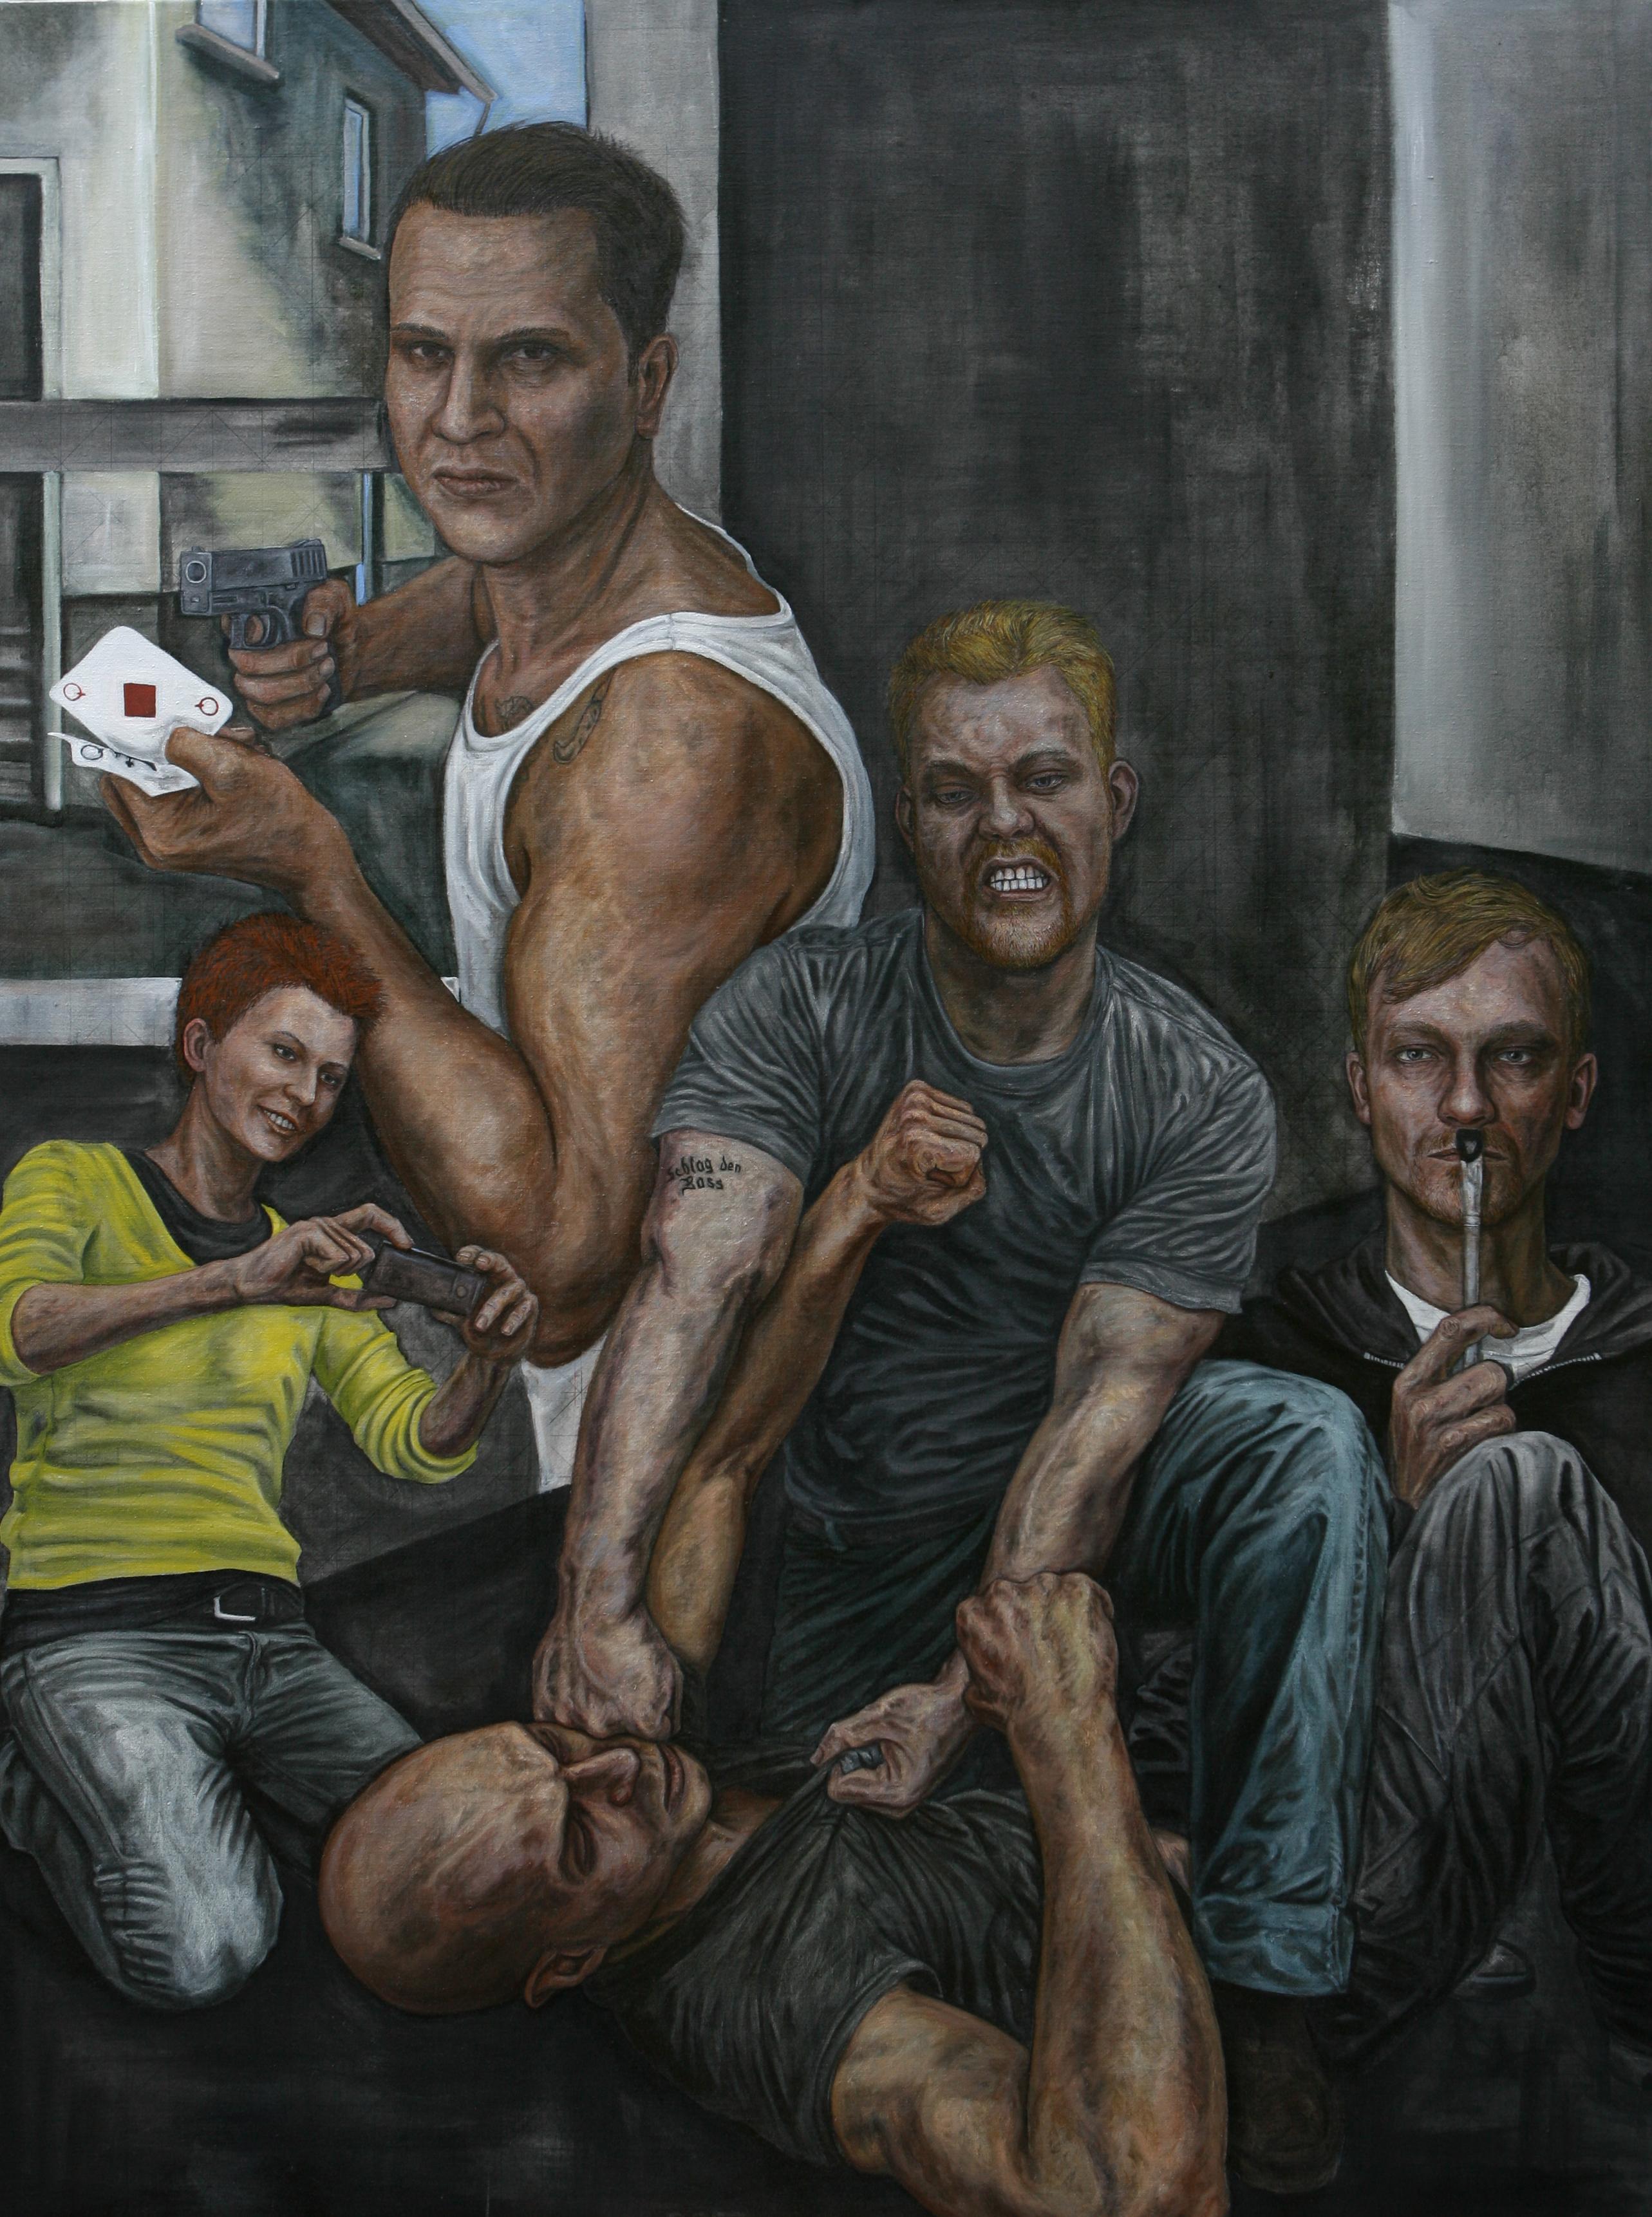 Fuck Art Dada siegt - Teil 1 - Öl - Leinwand 200x150cm